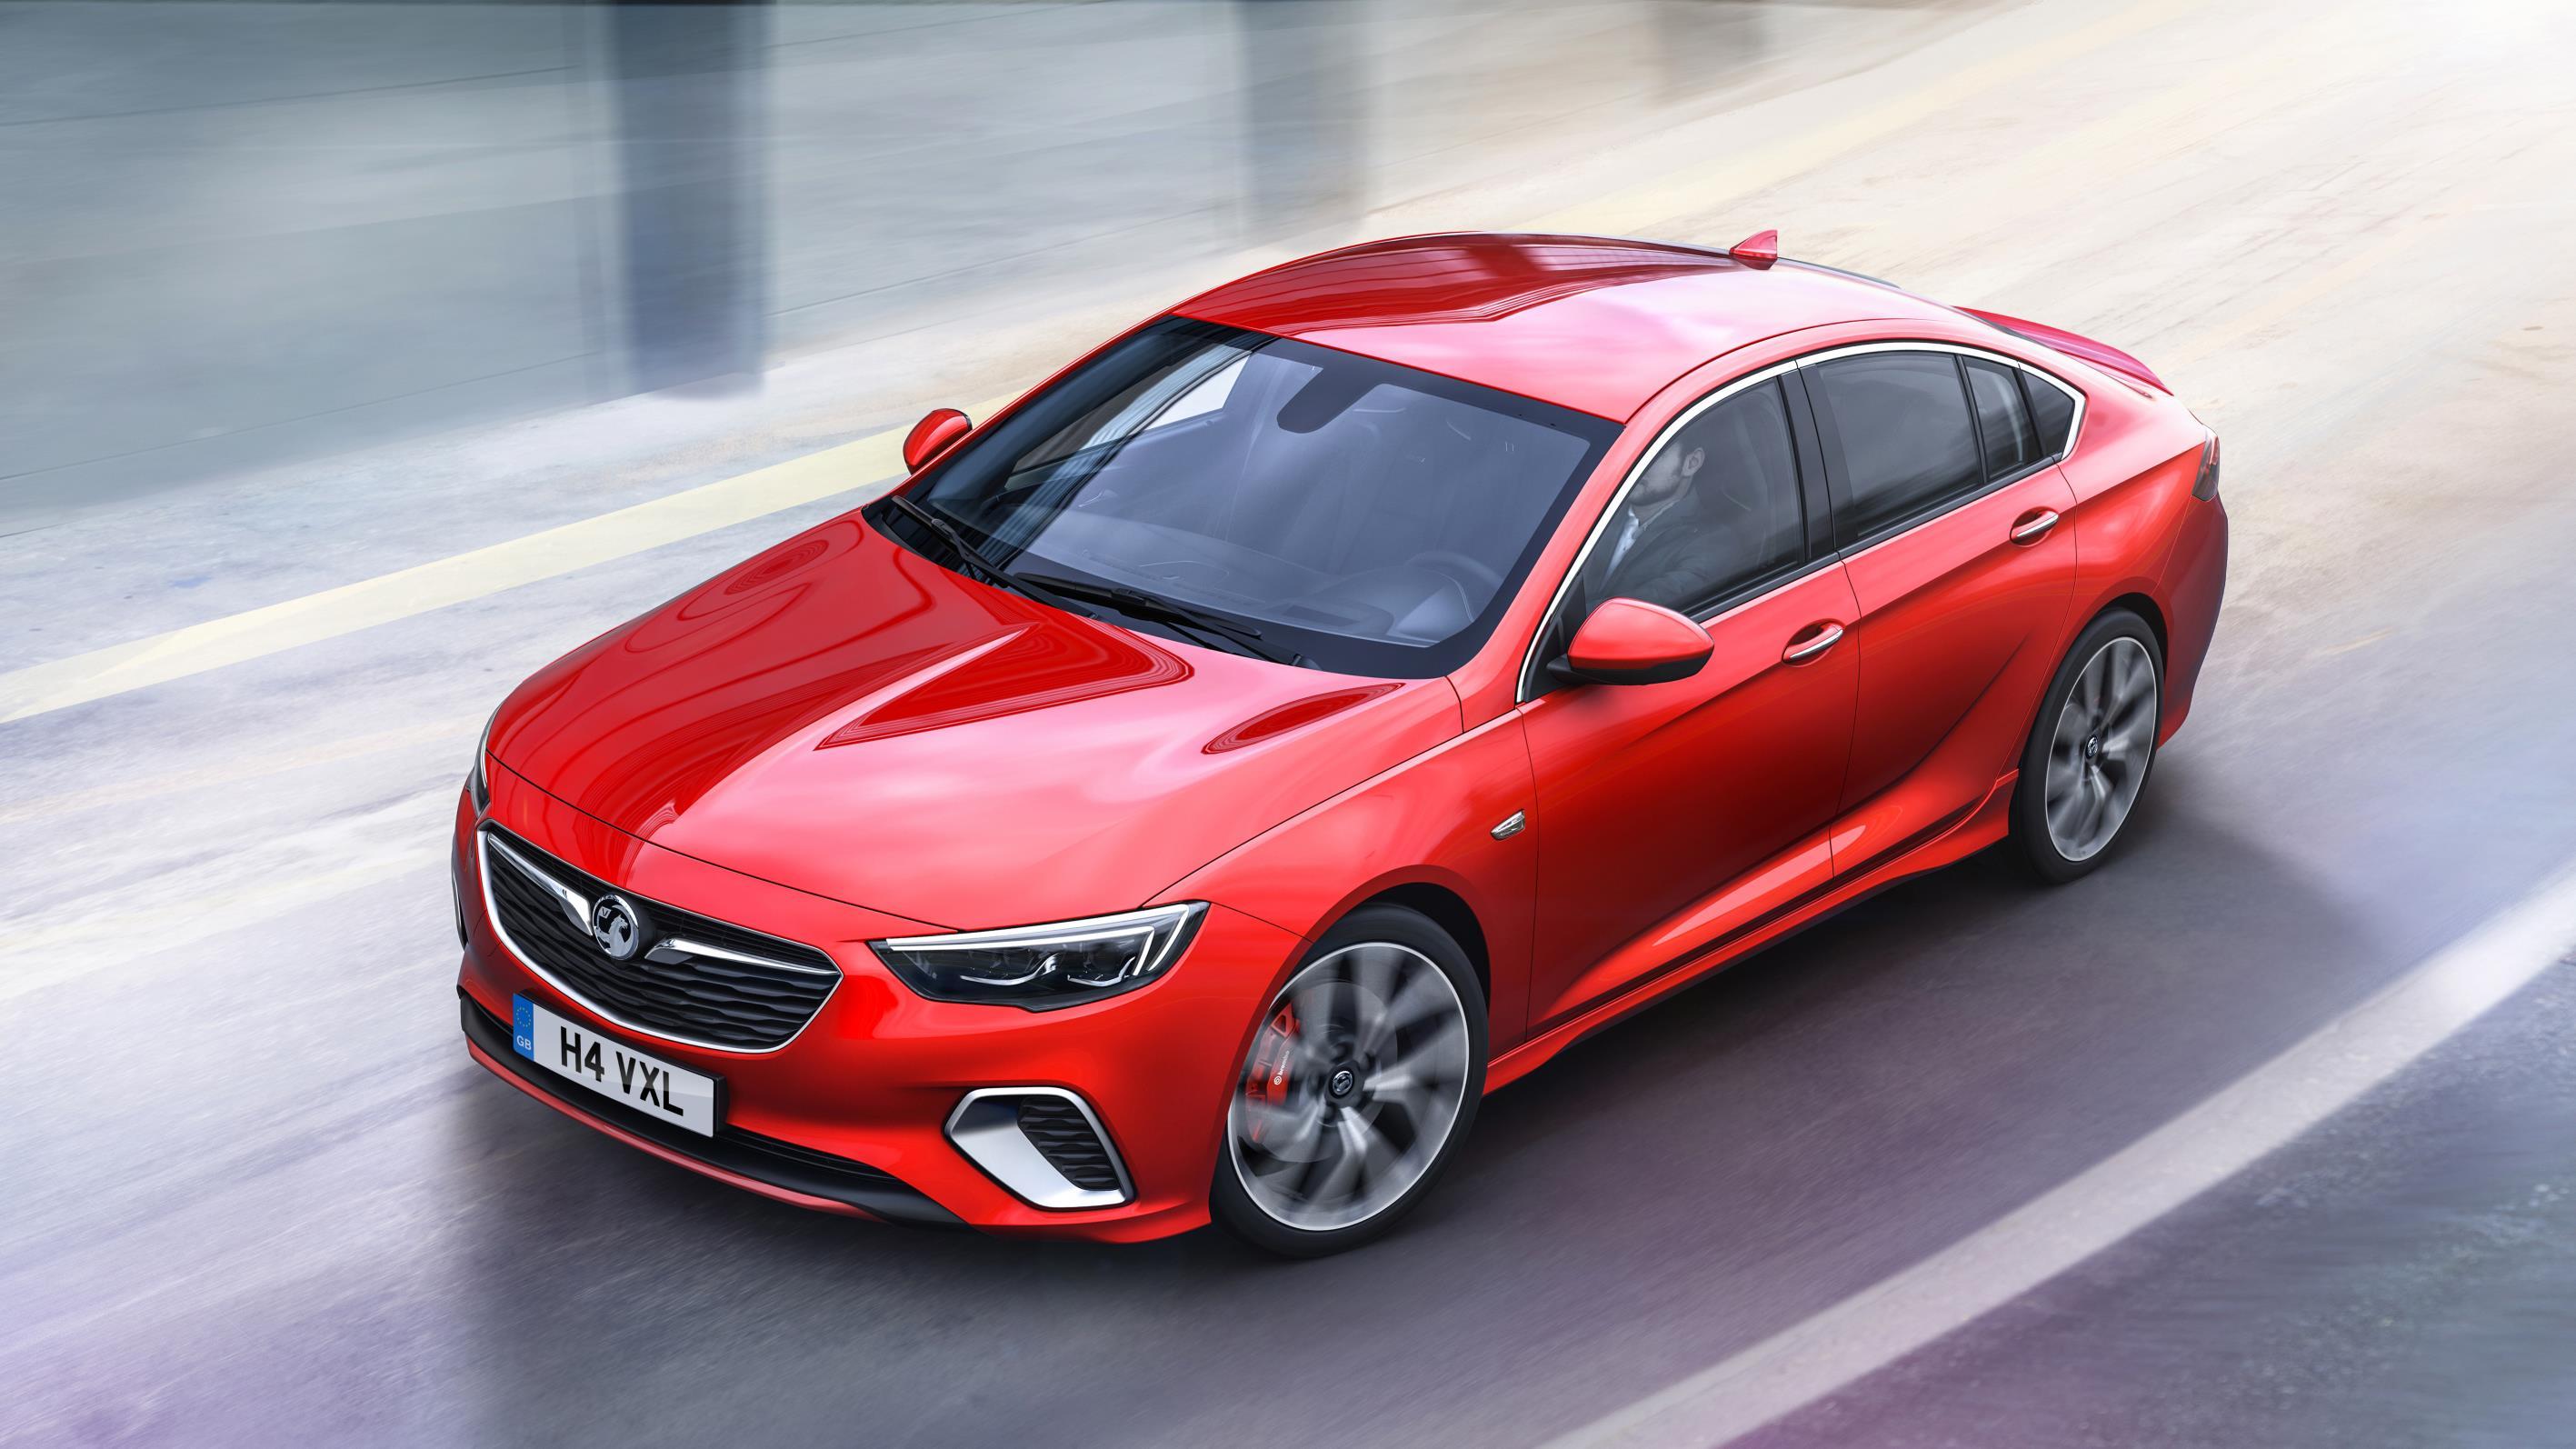 New Vauxhall Insignia GSi revealed